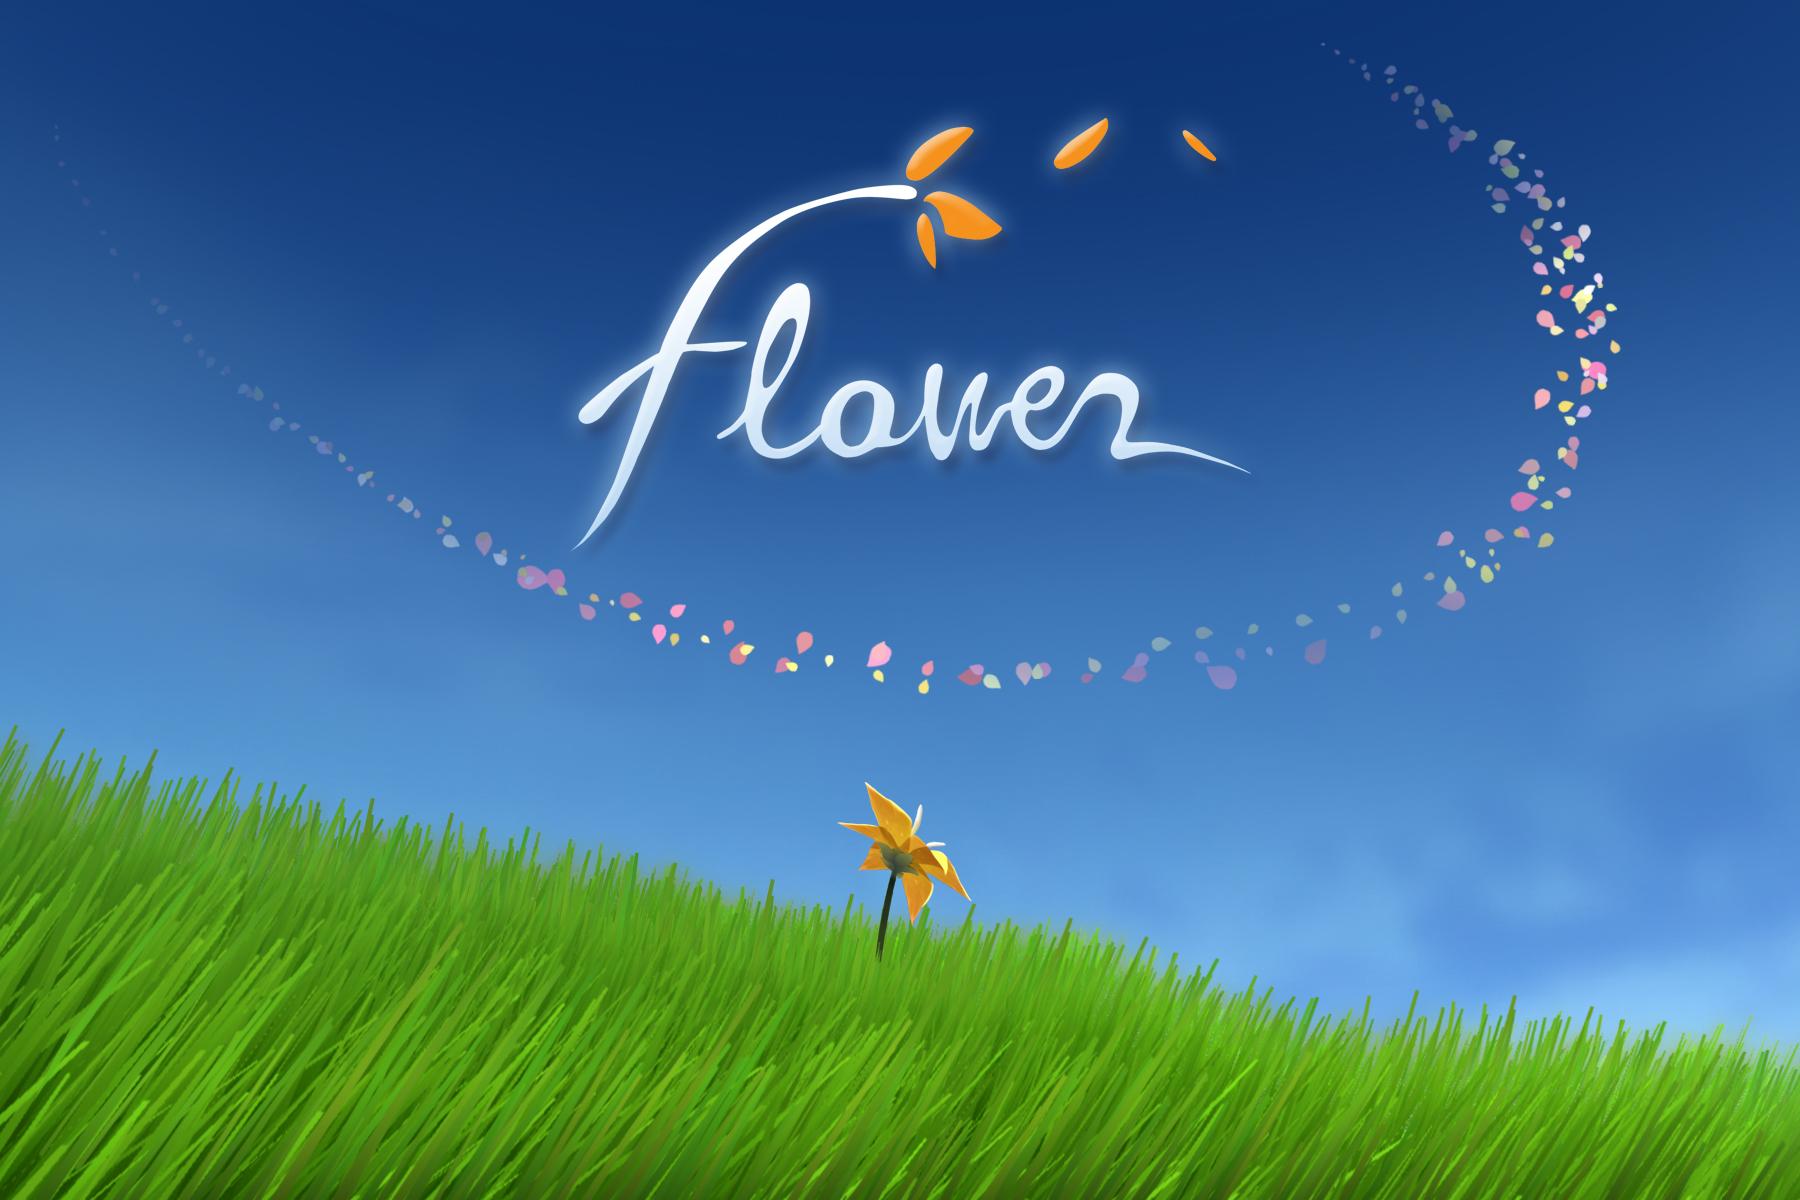 flower game wallpaper hd